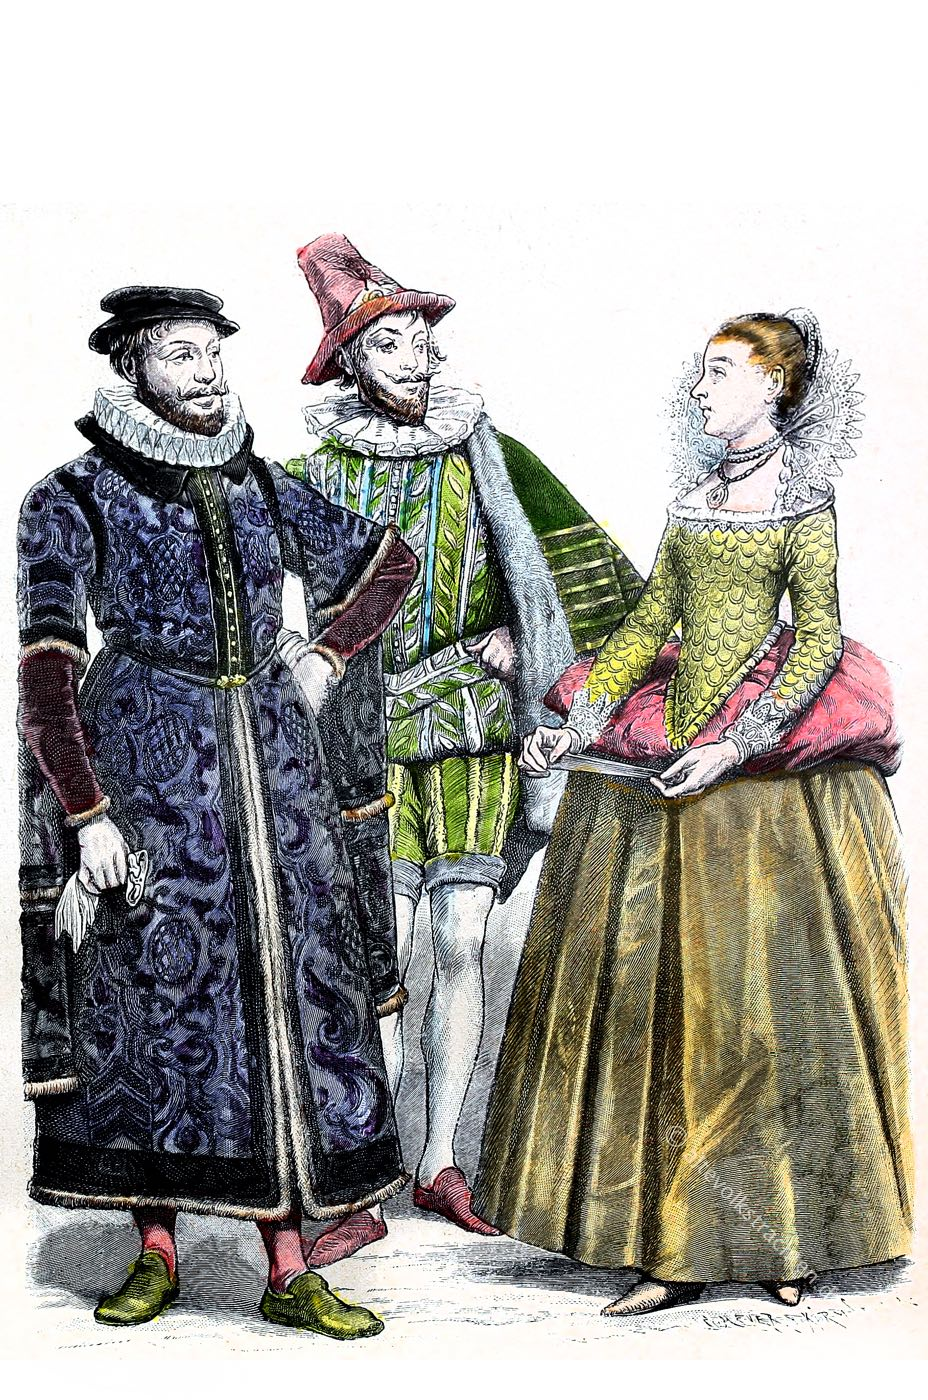 Münchener, Bilderbogen, England, Tudor, Mode, Renaissance